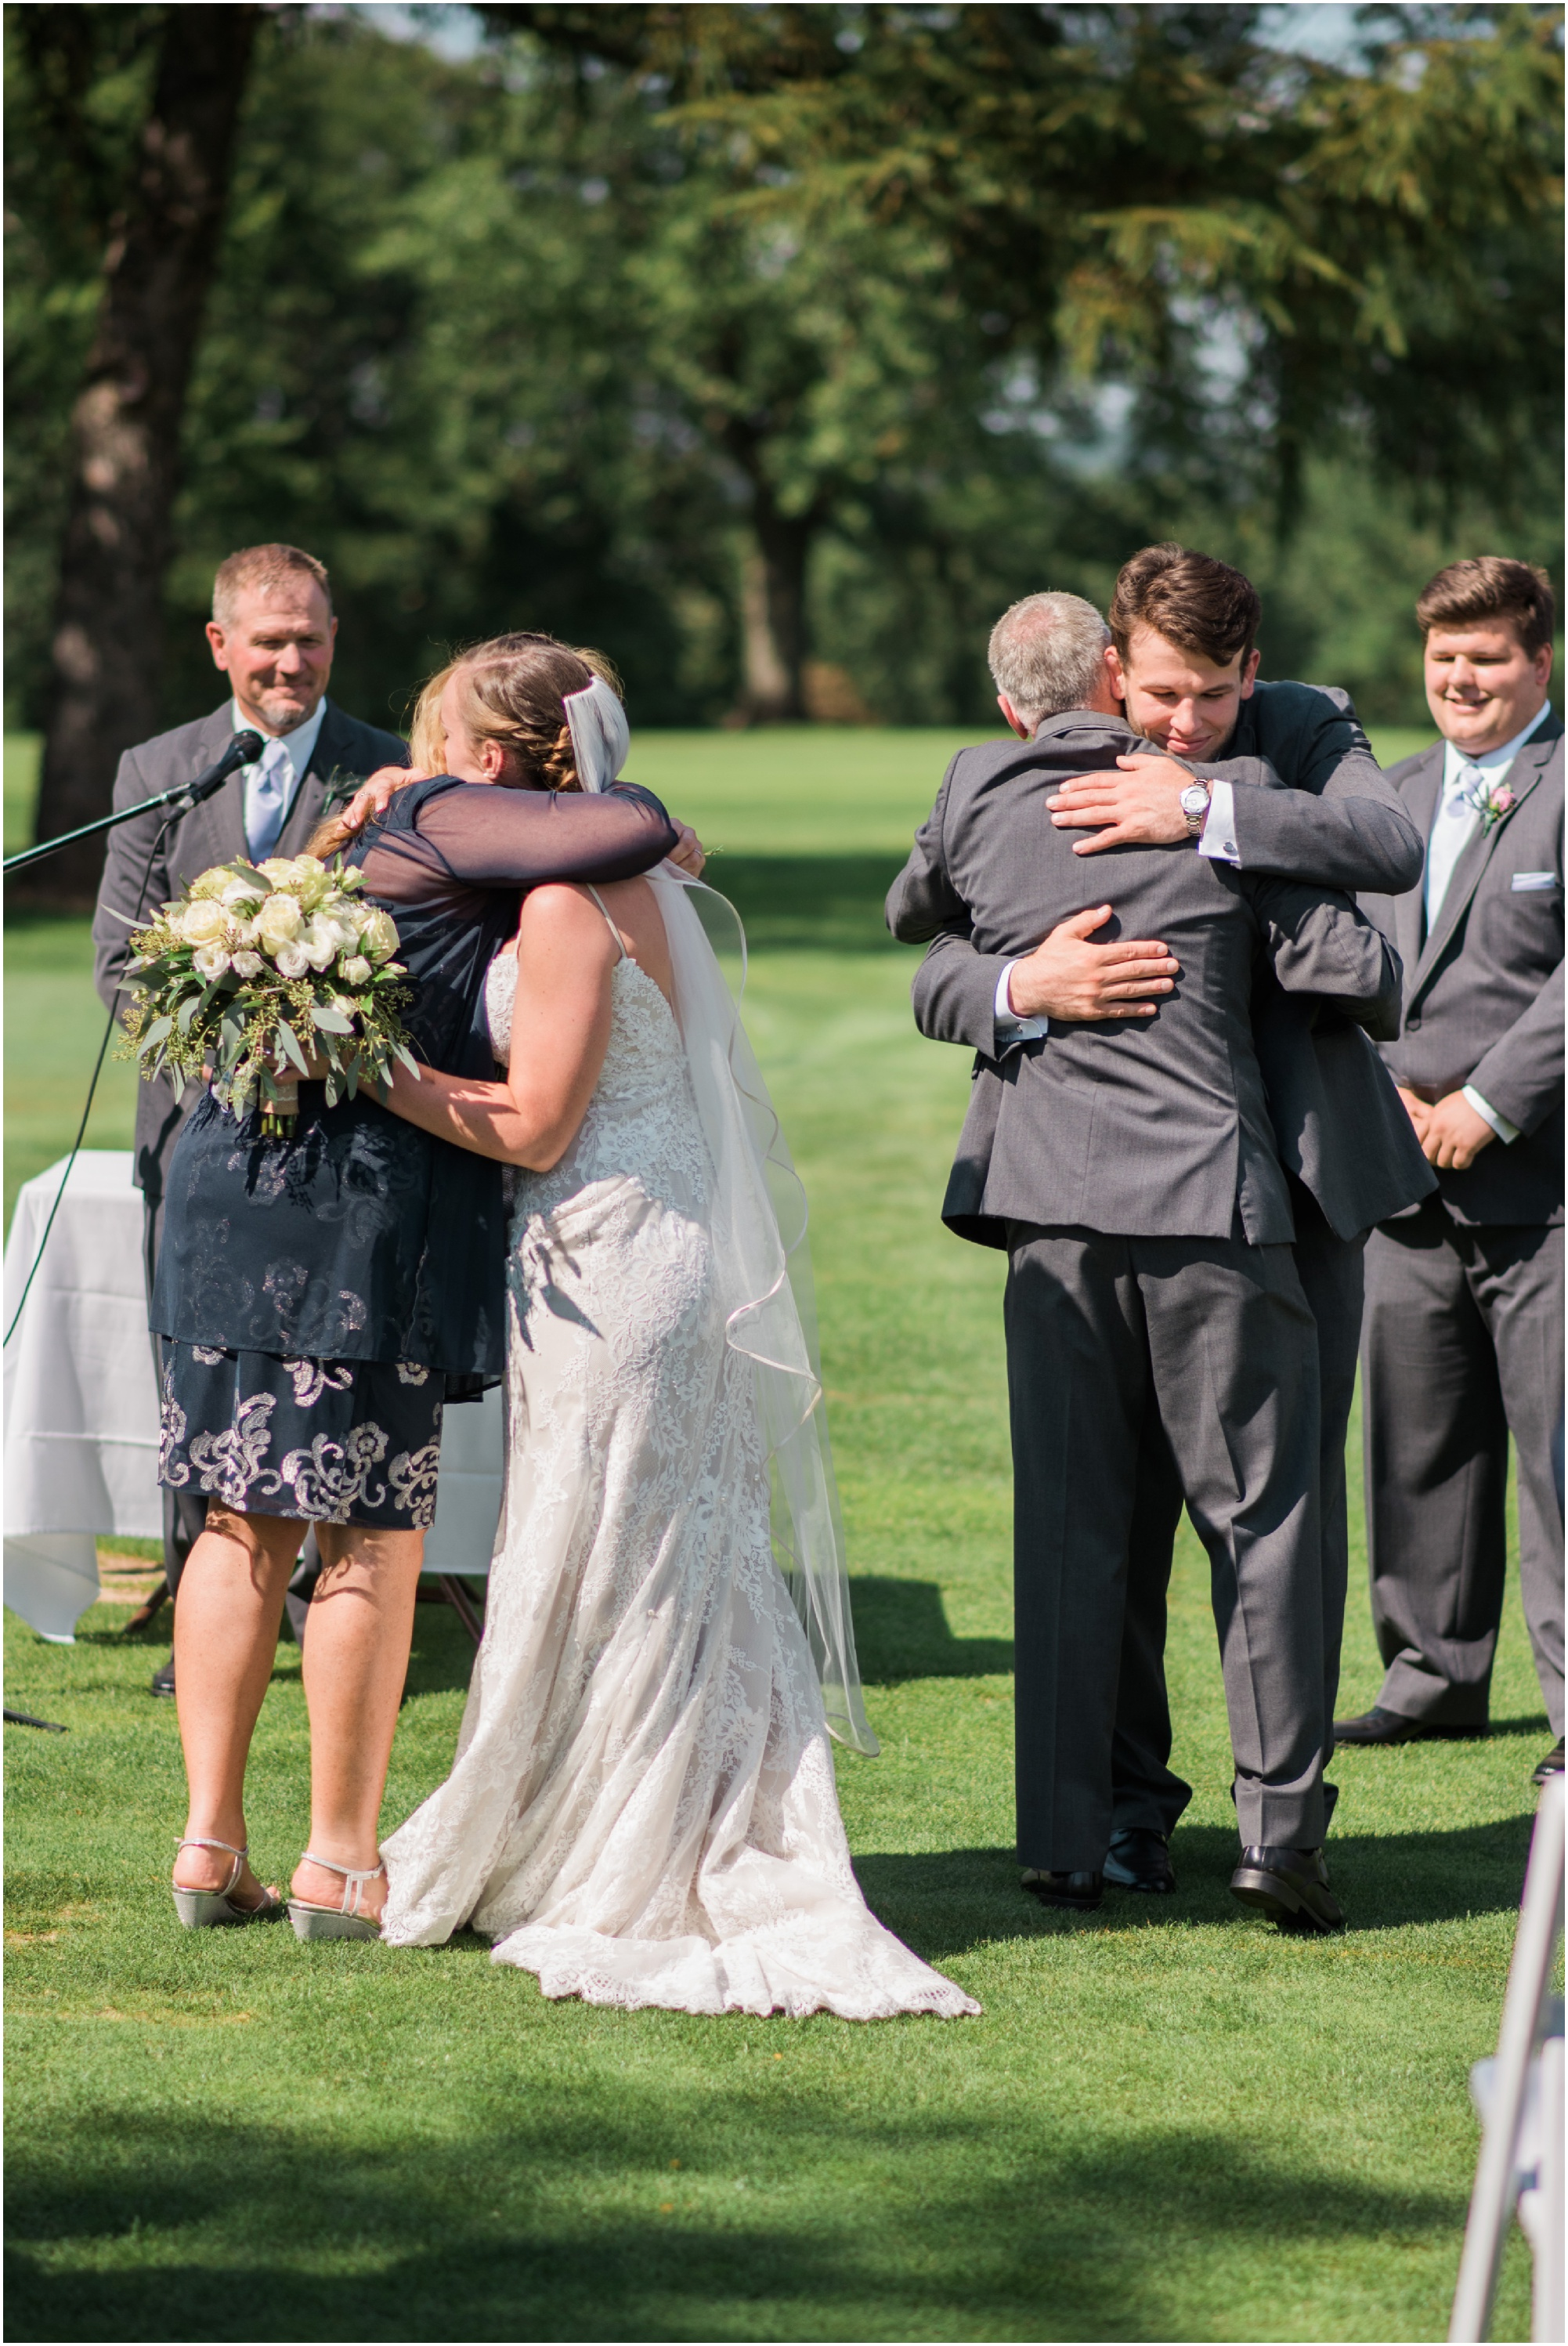 Wisconsin-Wedding-Photographer-Reedsburg-Country-Club-Kaela-and Matt-Wedding-440.jpg